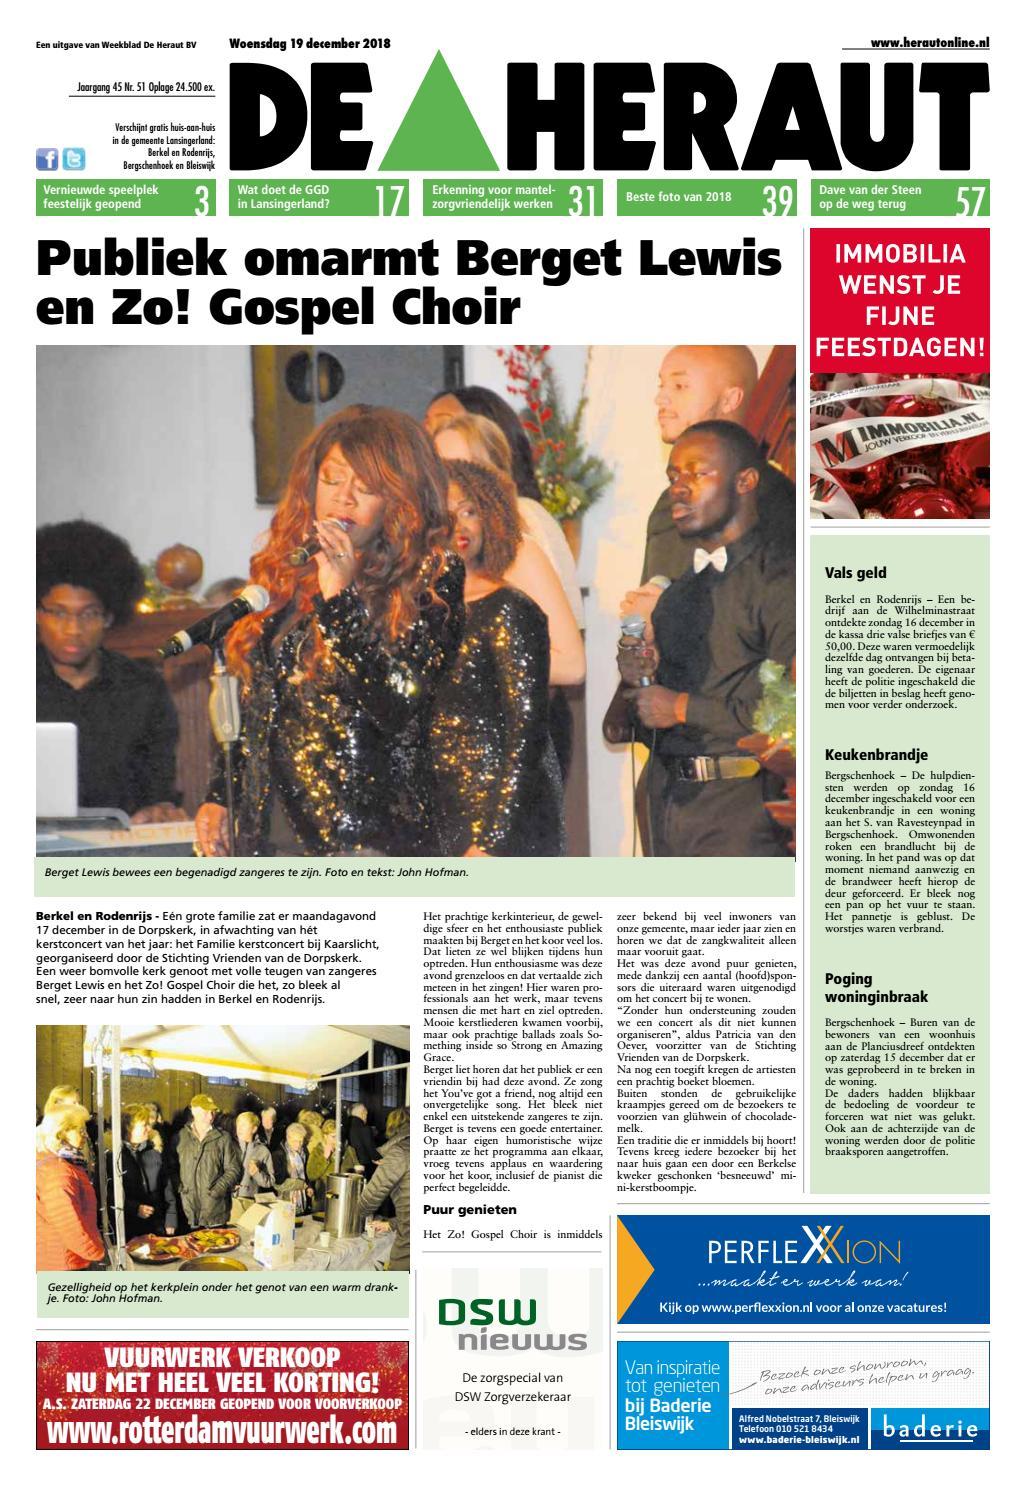 cb9fec96405b46 Heraut week 51 2018 by Nieuwsblad De Heraut - issuu